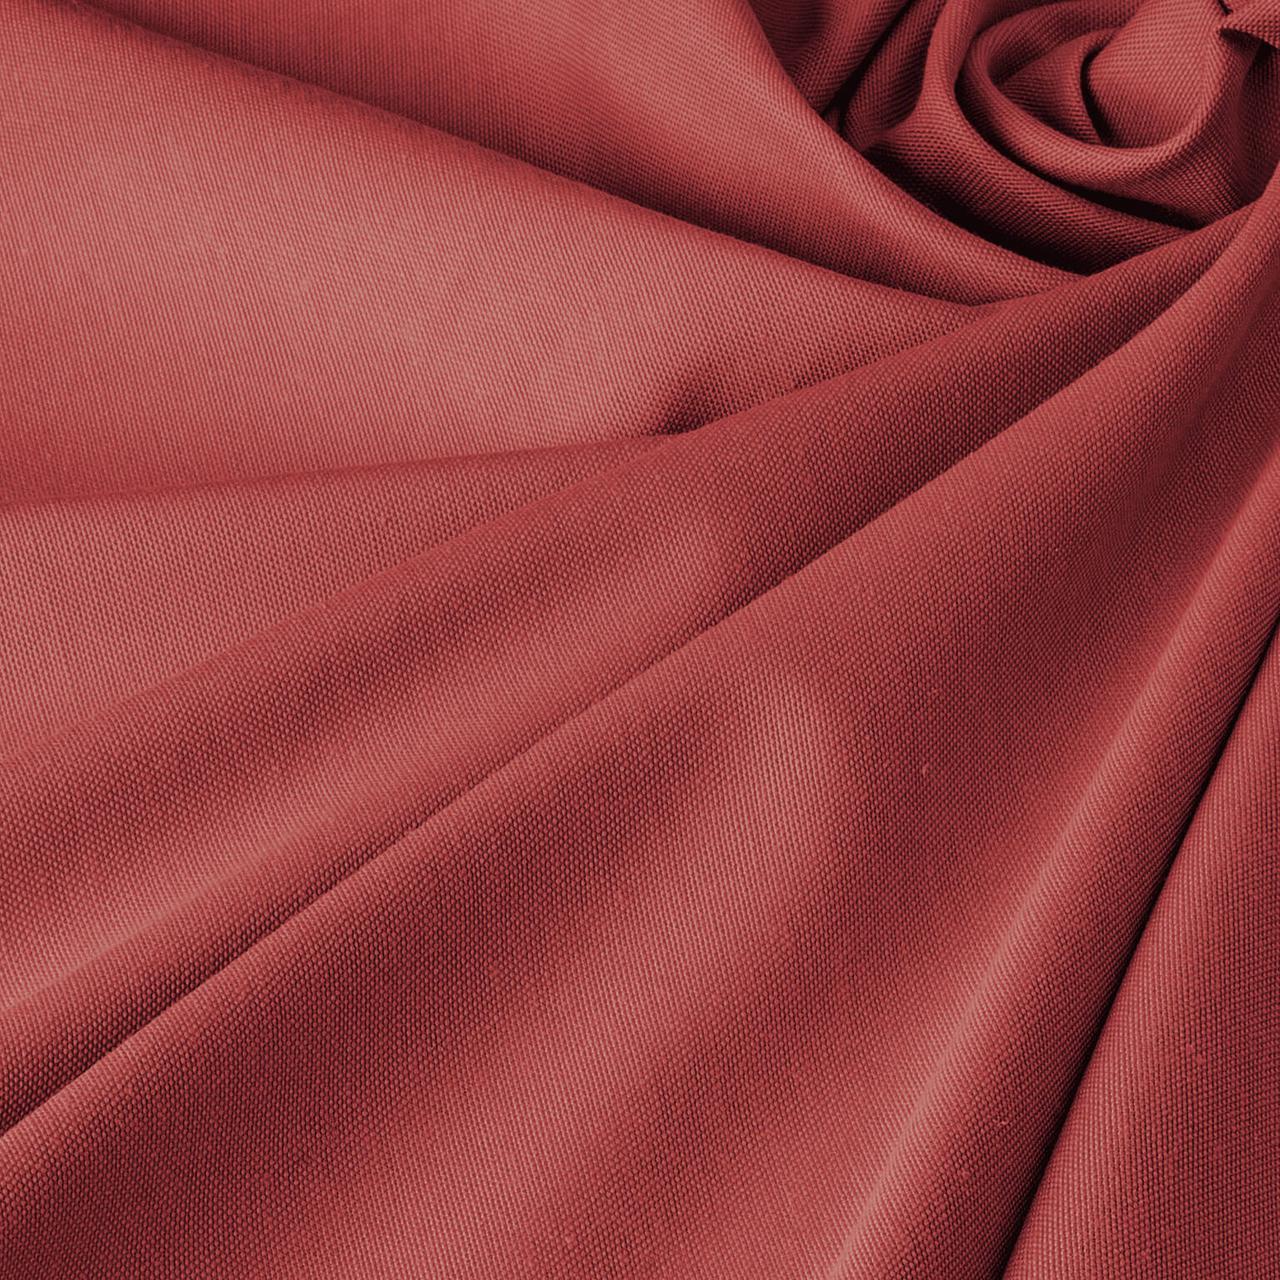 Портьерная ткань для штор DRK-7437